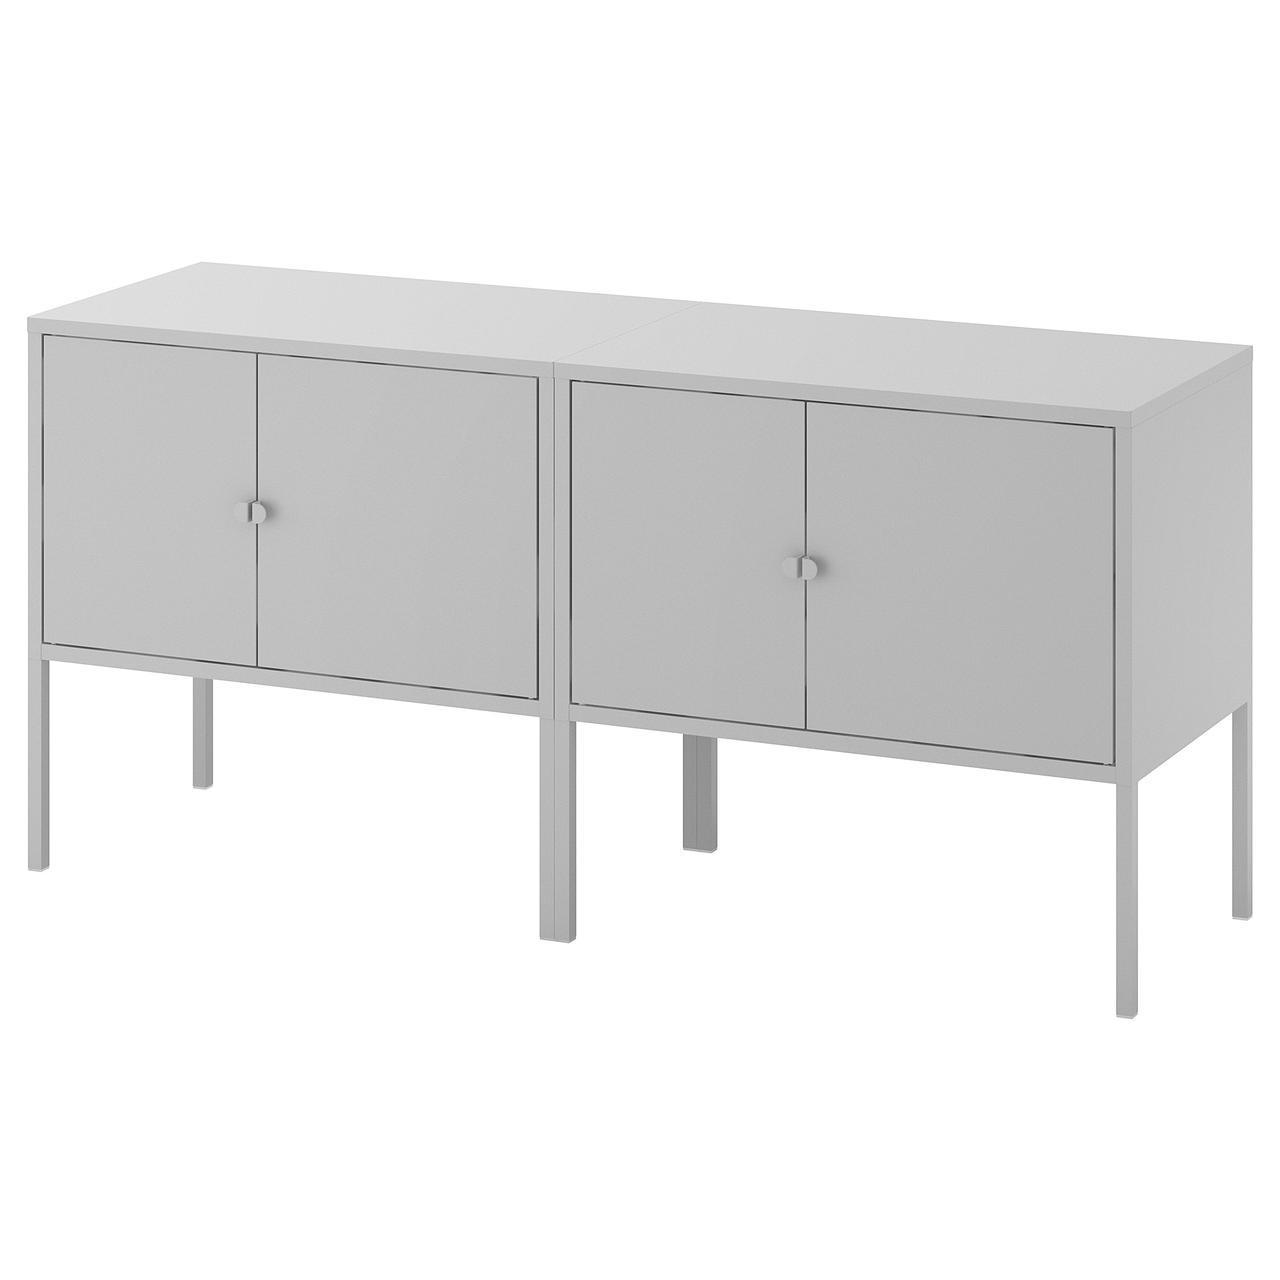 IKEA LIXHULT (192.791.77) Комбинация шкафов, серый